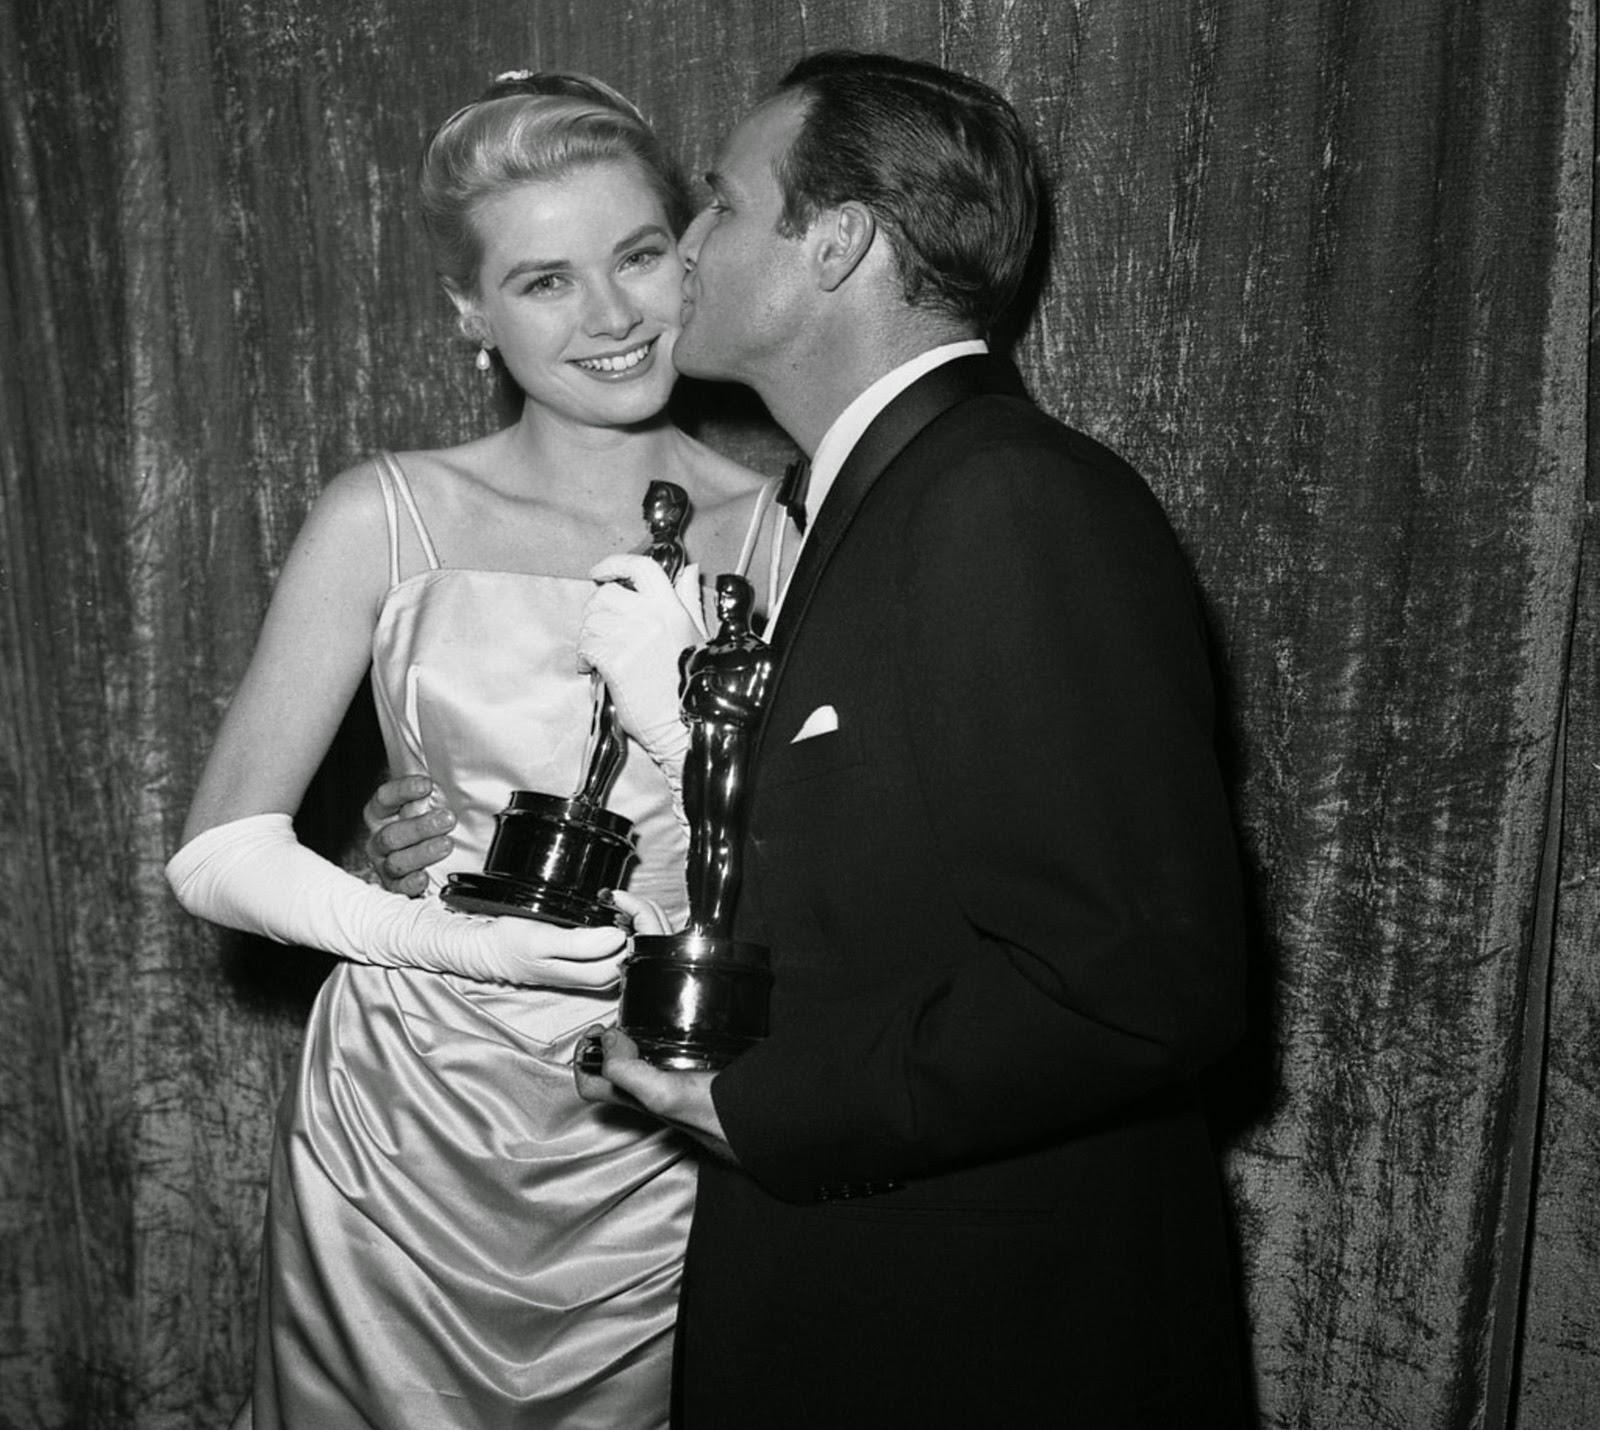 Oscary 1954 - Grace Kelly & Marlon Brando